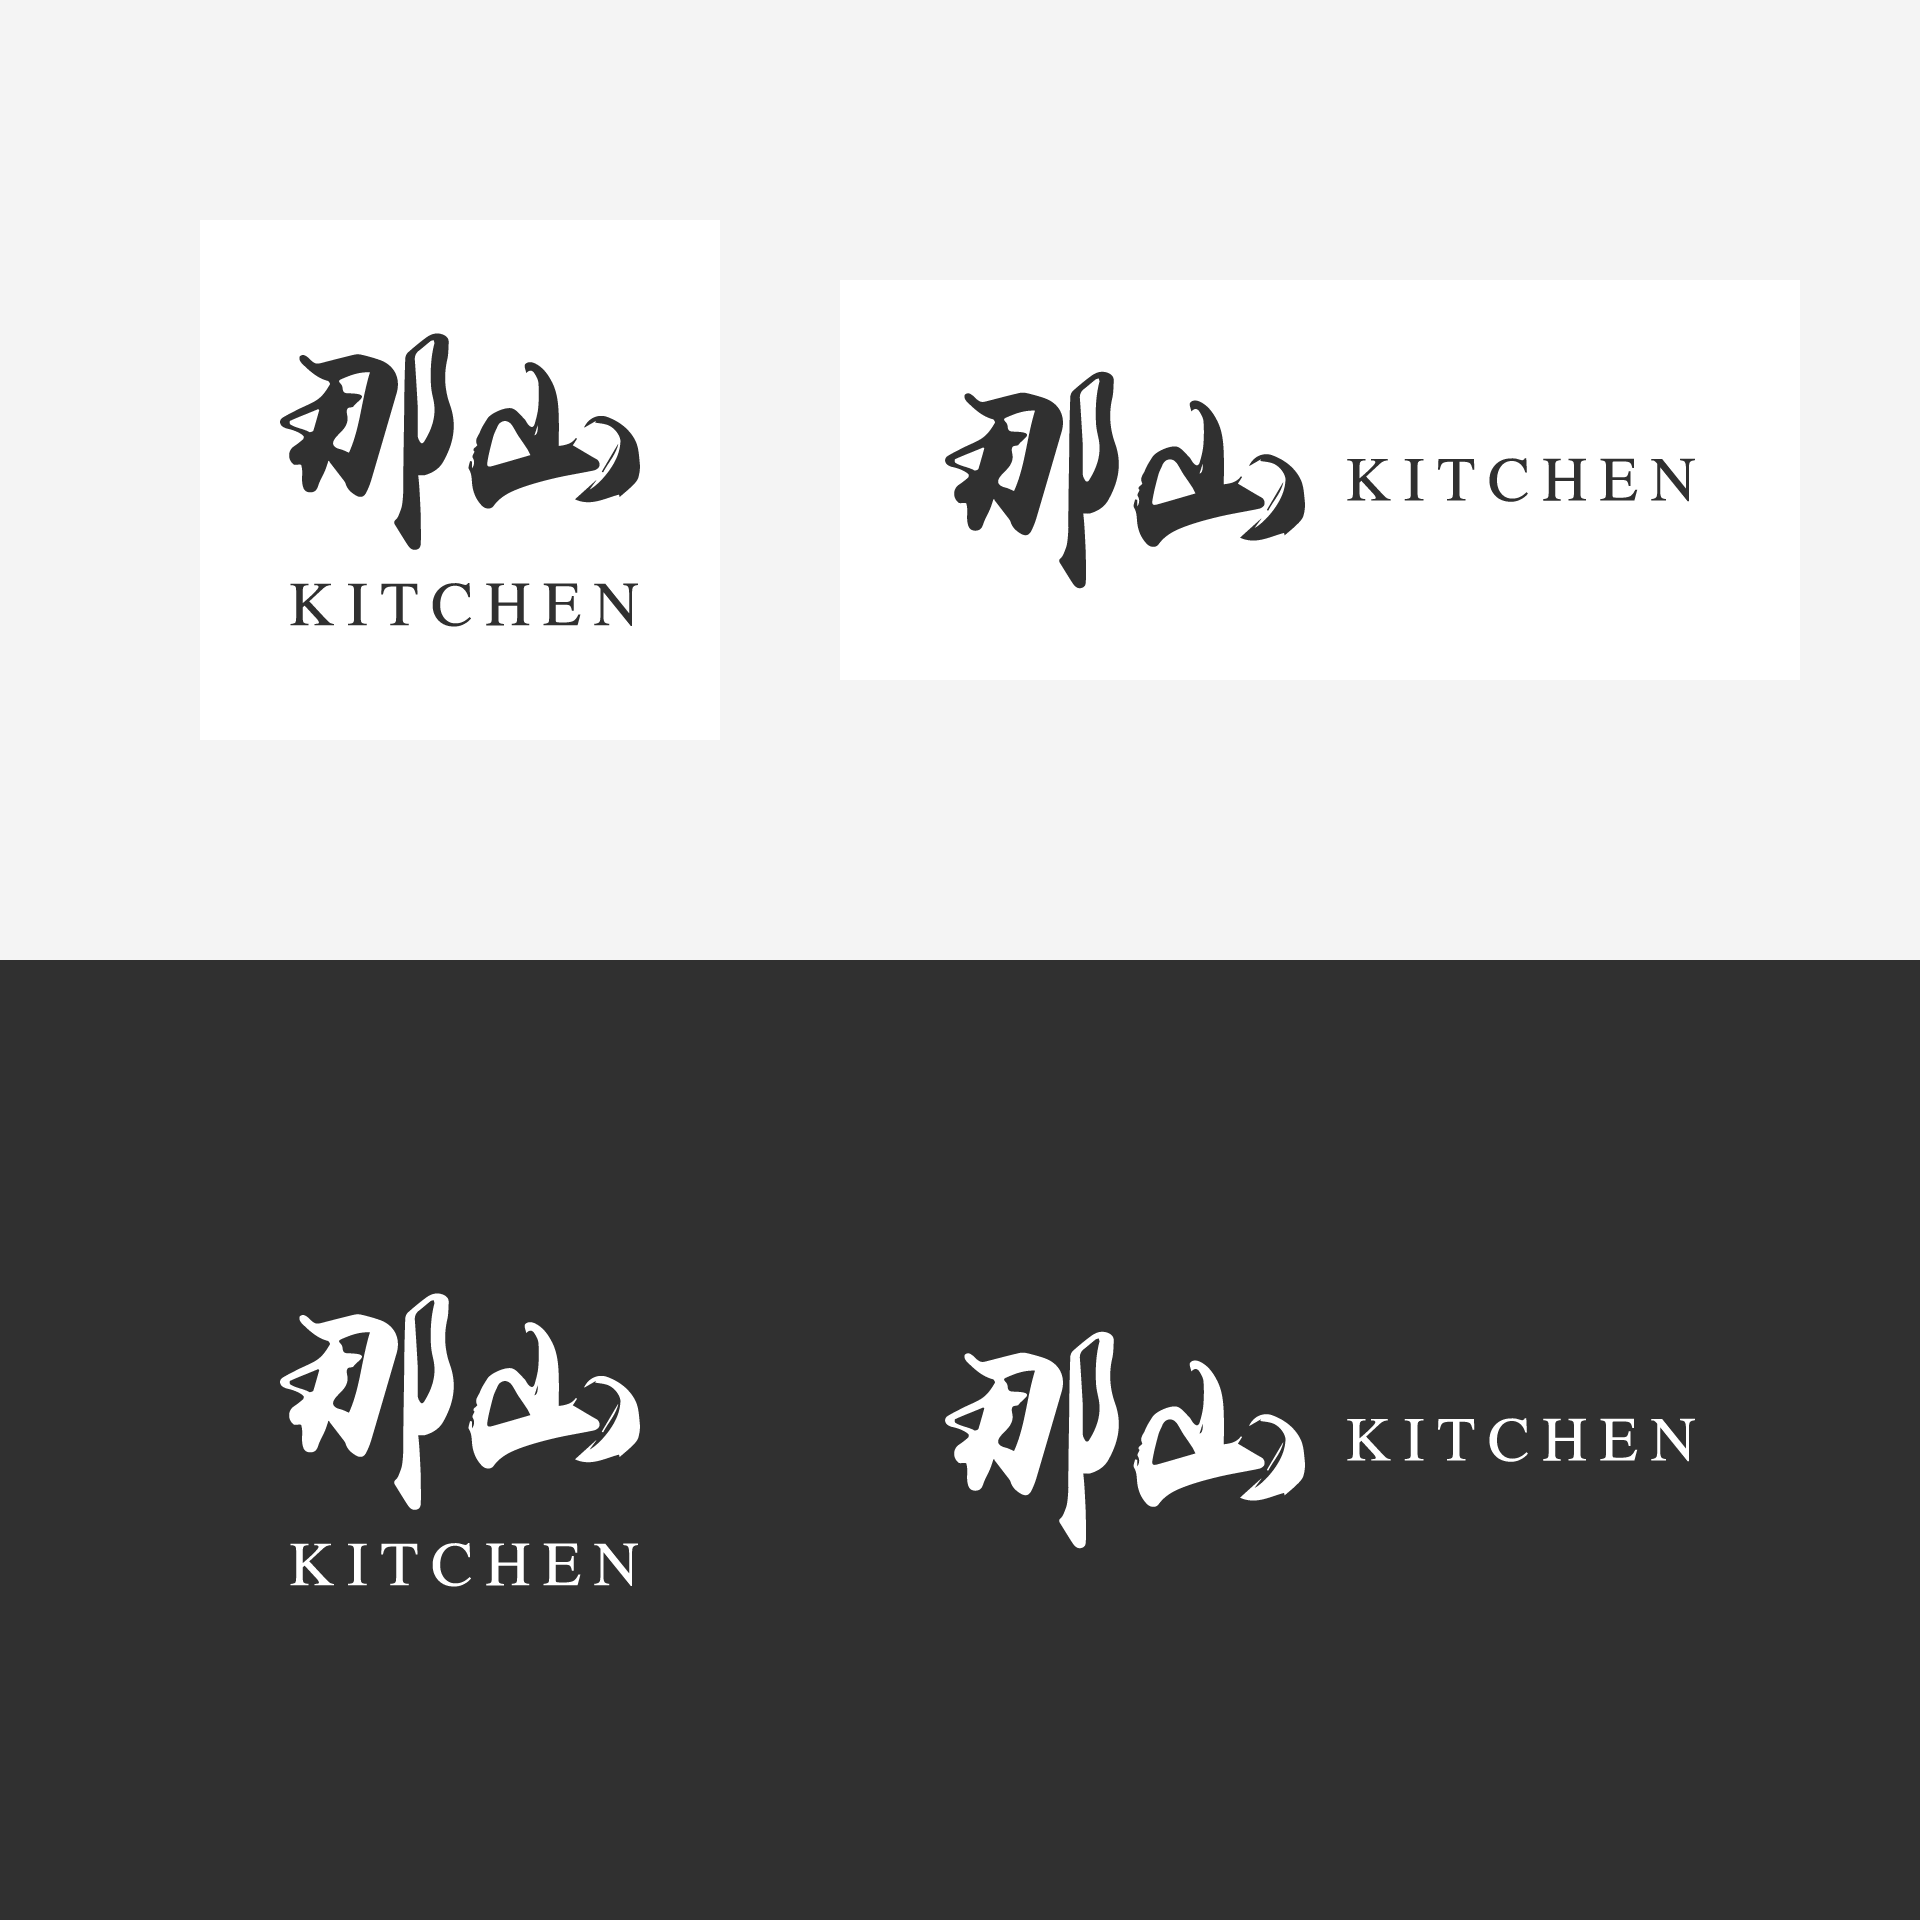 那山 Kitchen 品牌 Logo